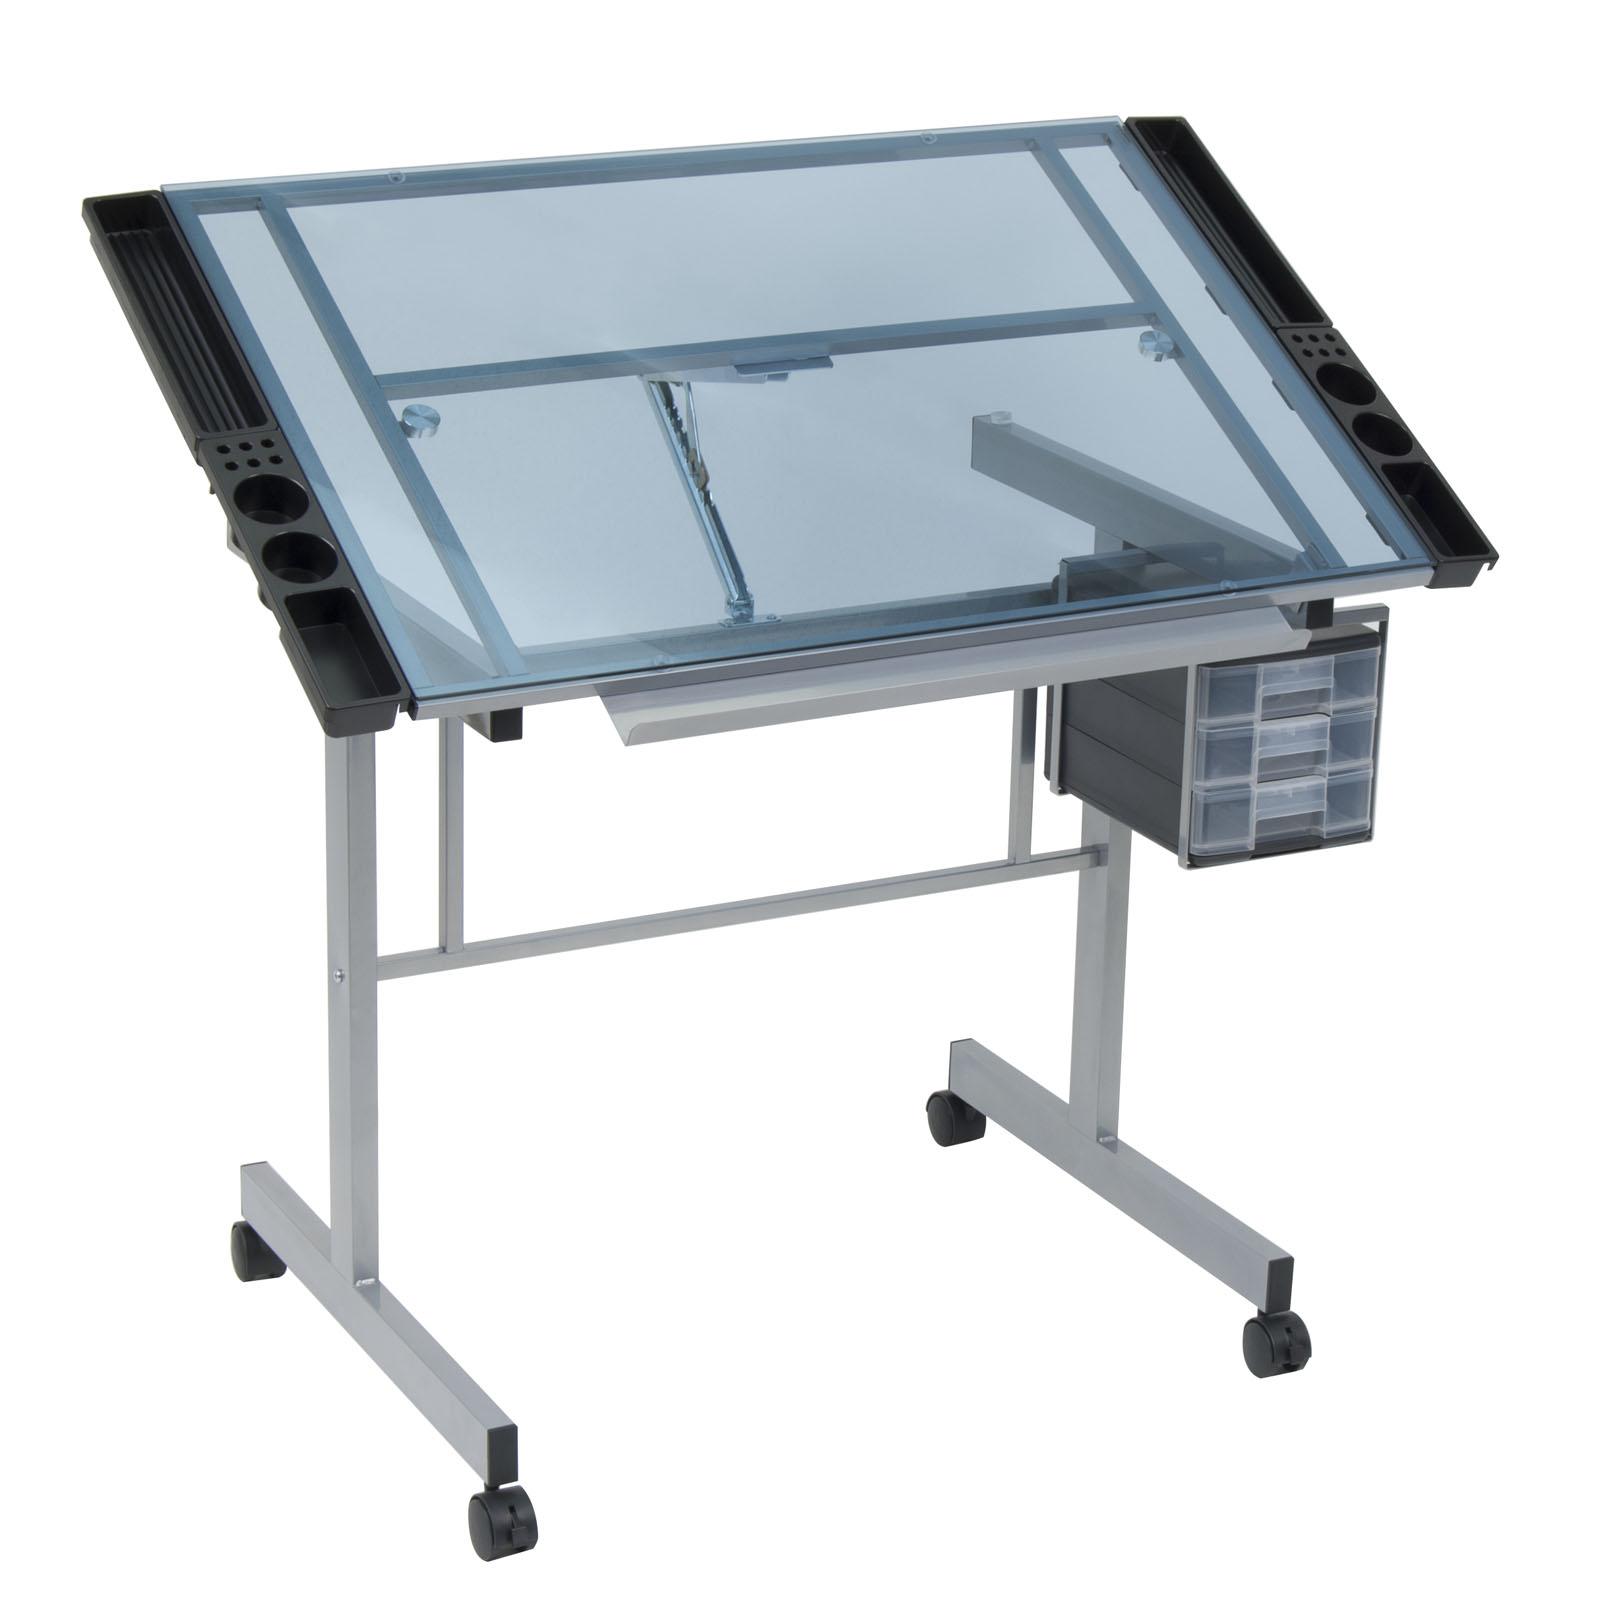 Sku 10053 Silver Blue Glass Arts Crafts Tables